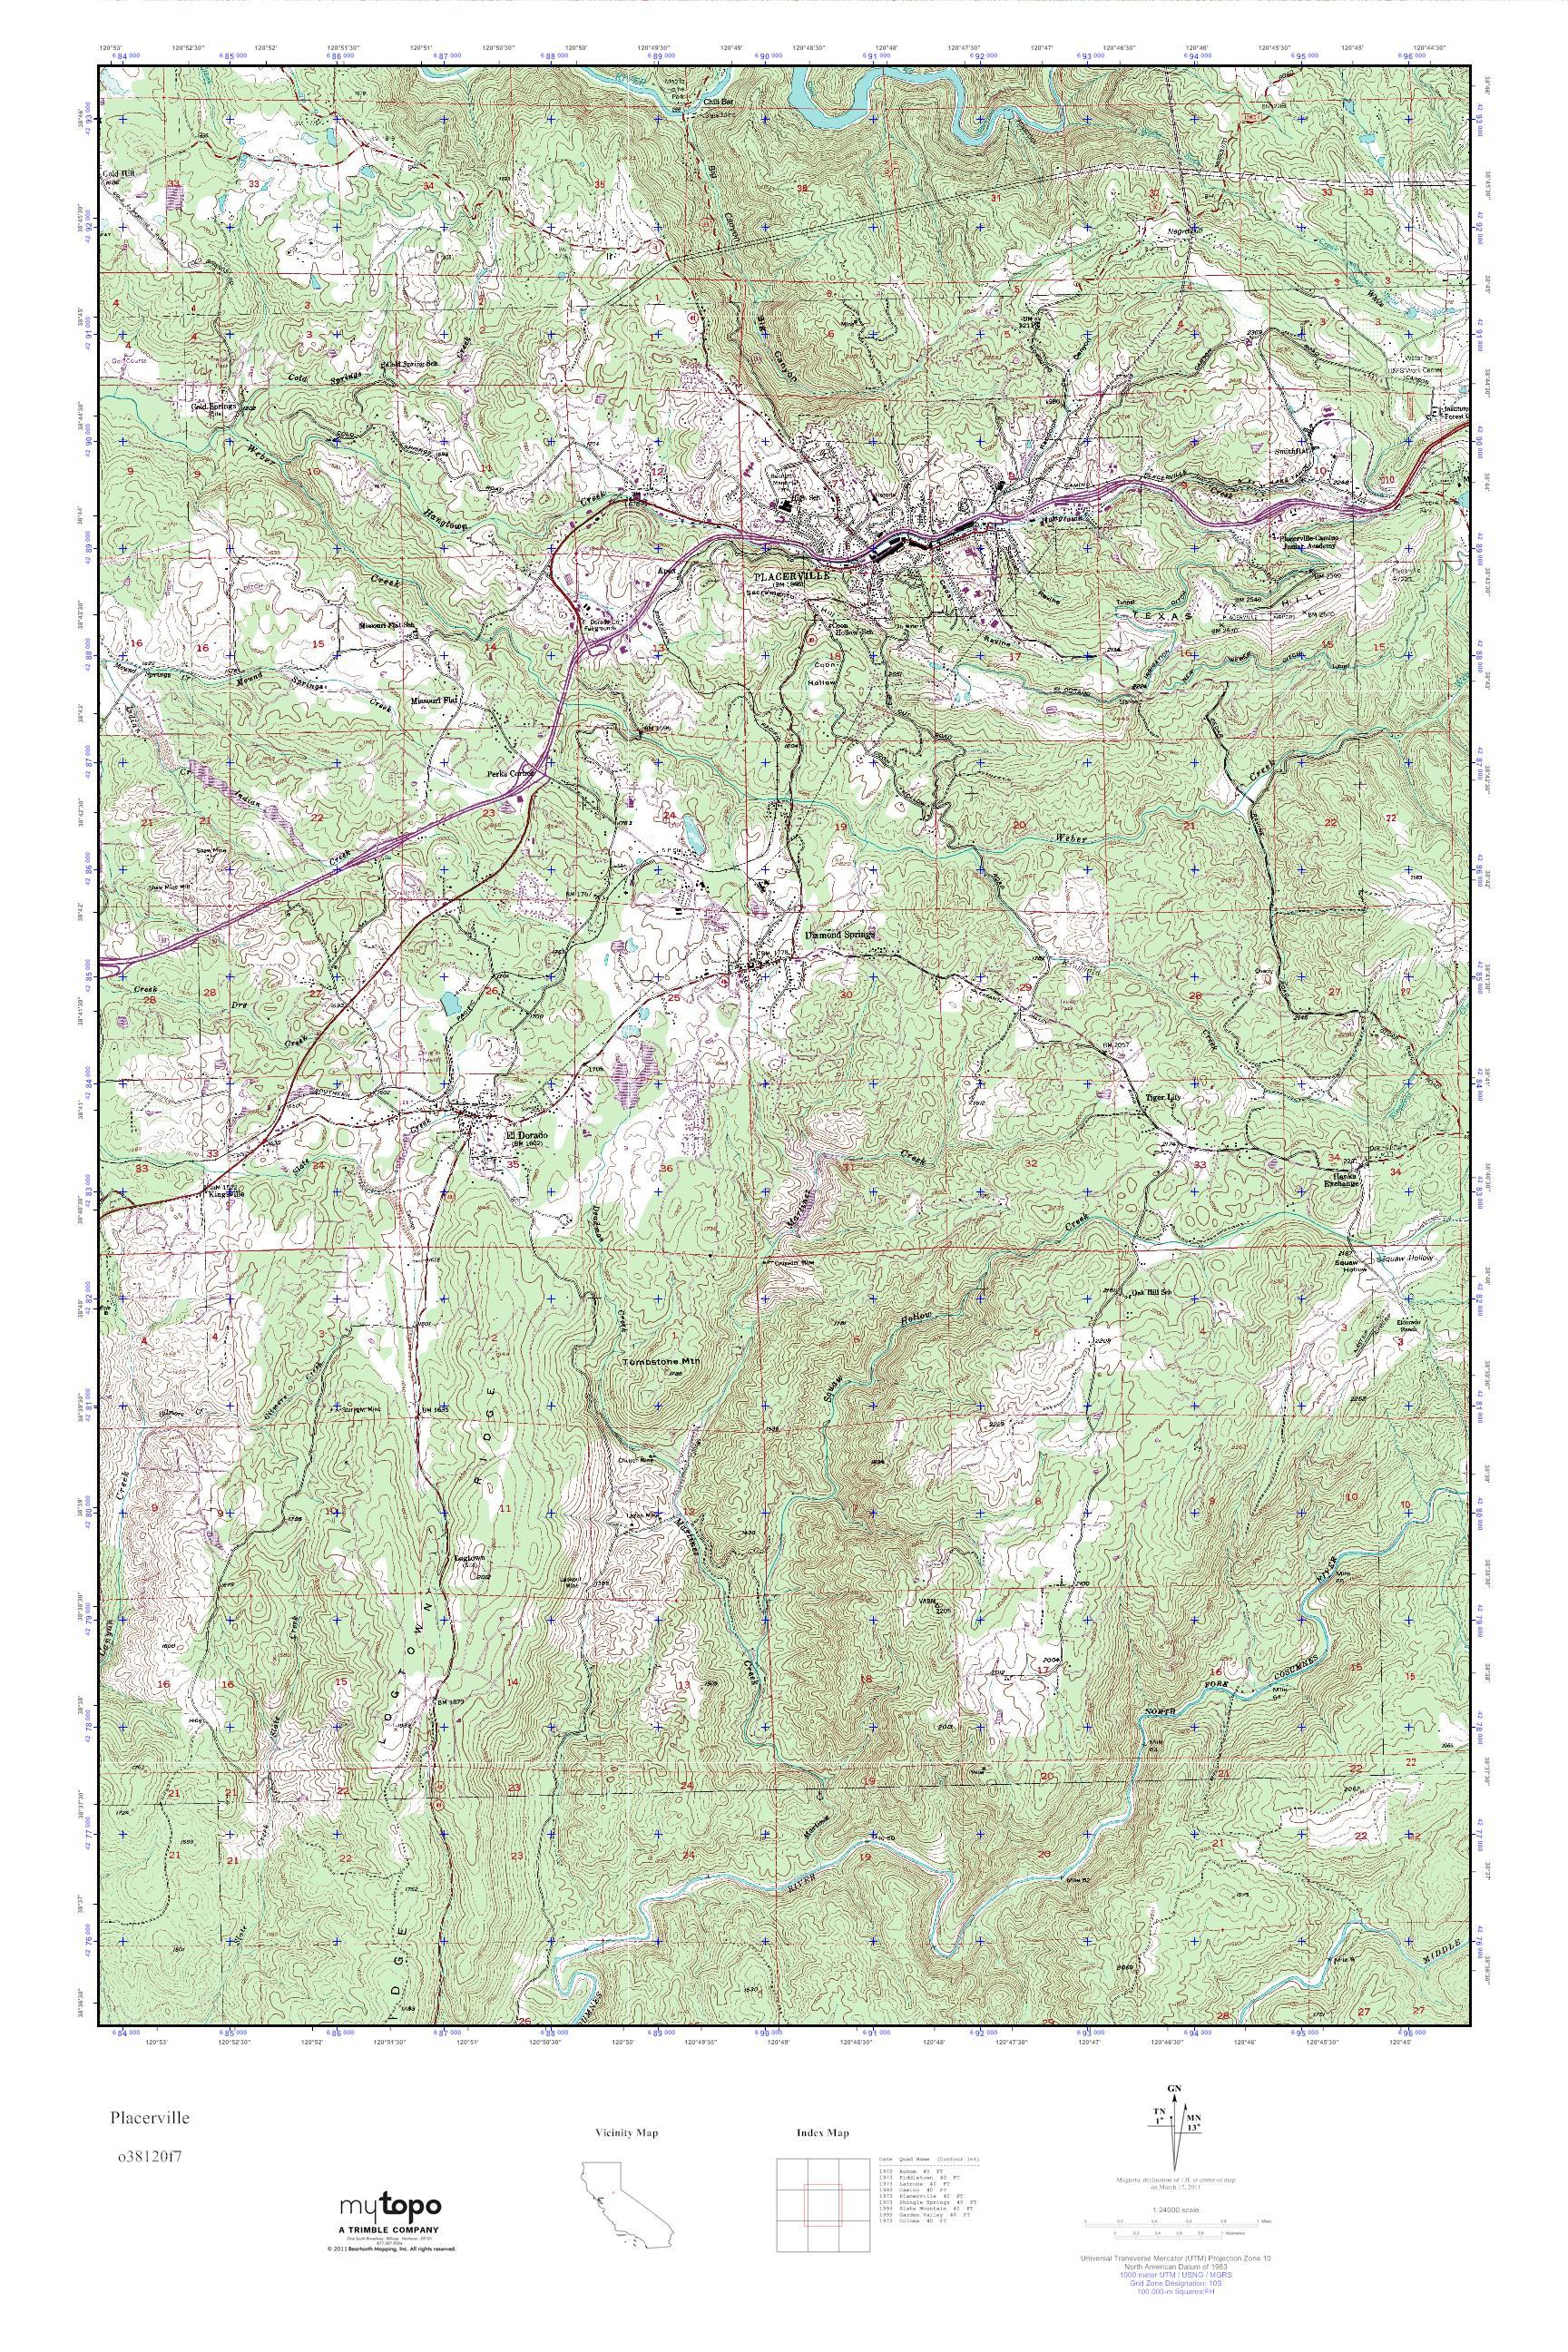 Placerville California Map.Mytopo Placerville California Usgs Quad Topo Map